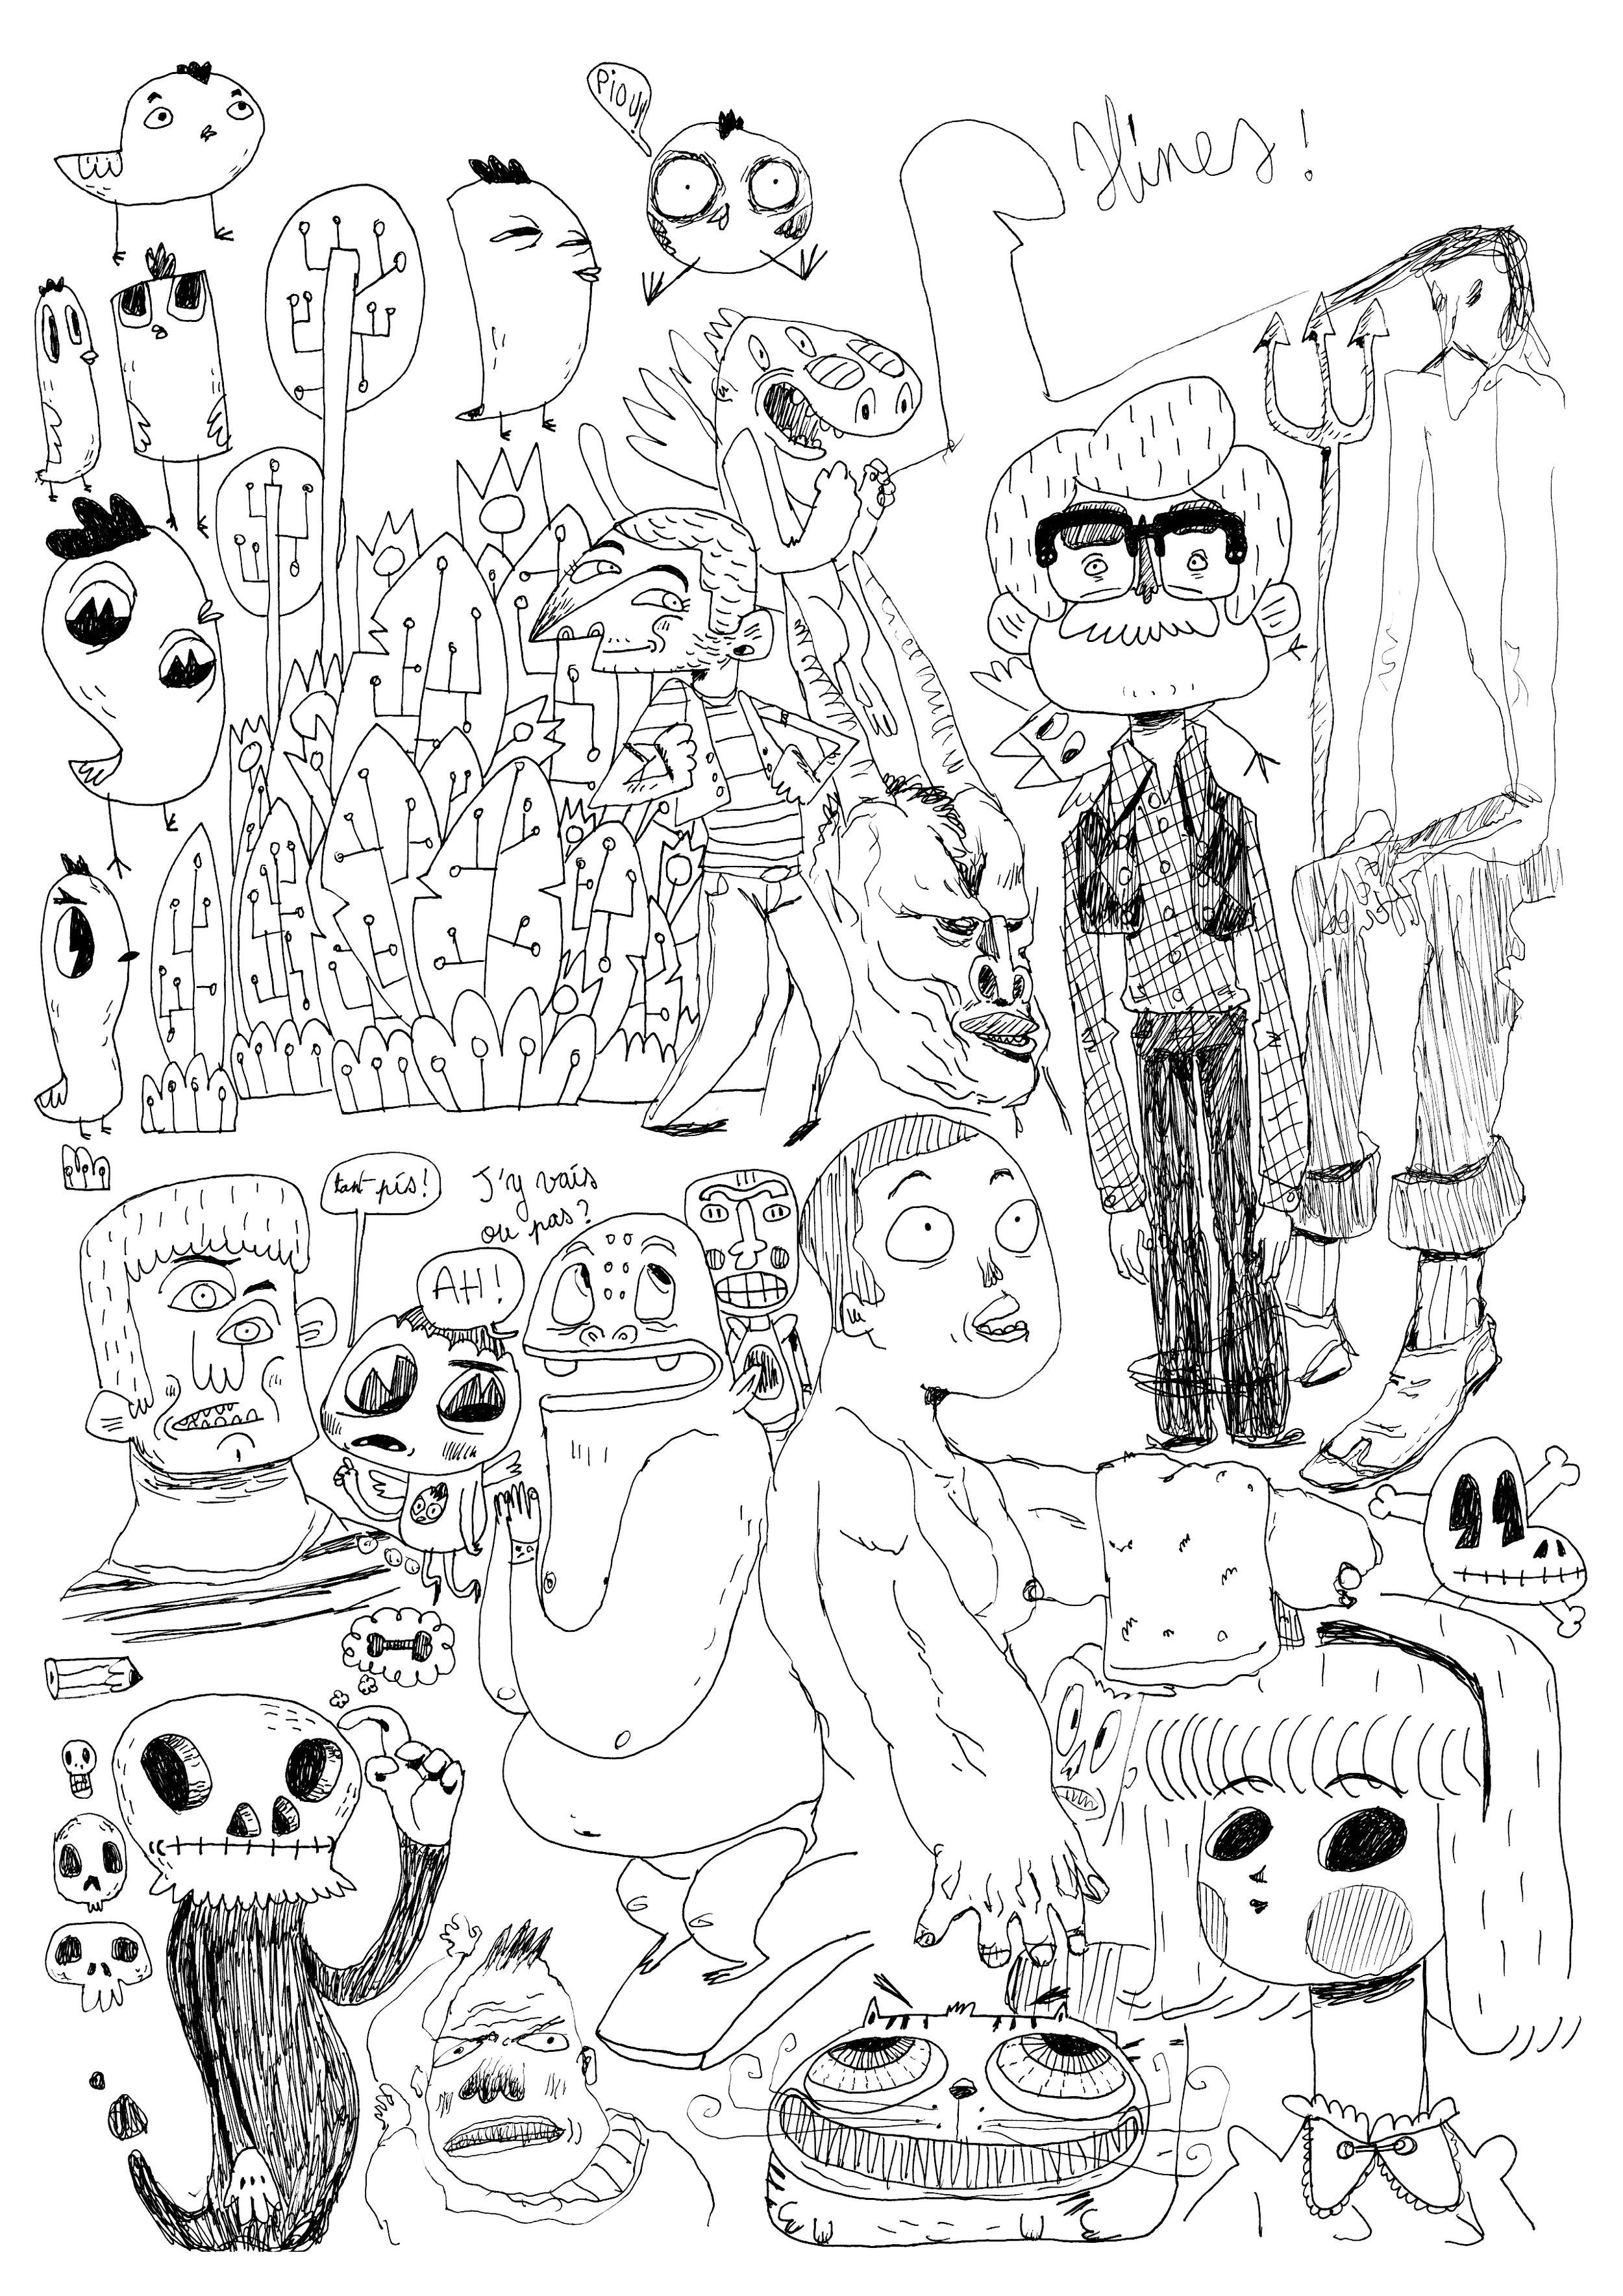 Pascal_Zaffiro_Doodle_23.jpg